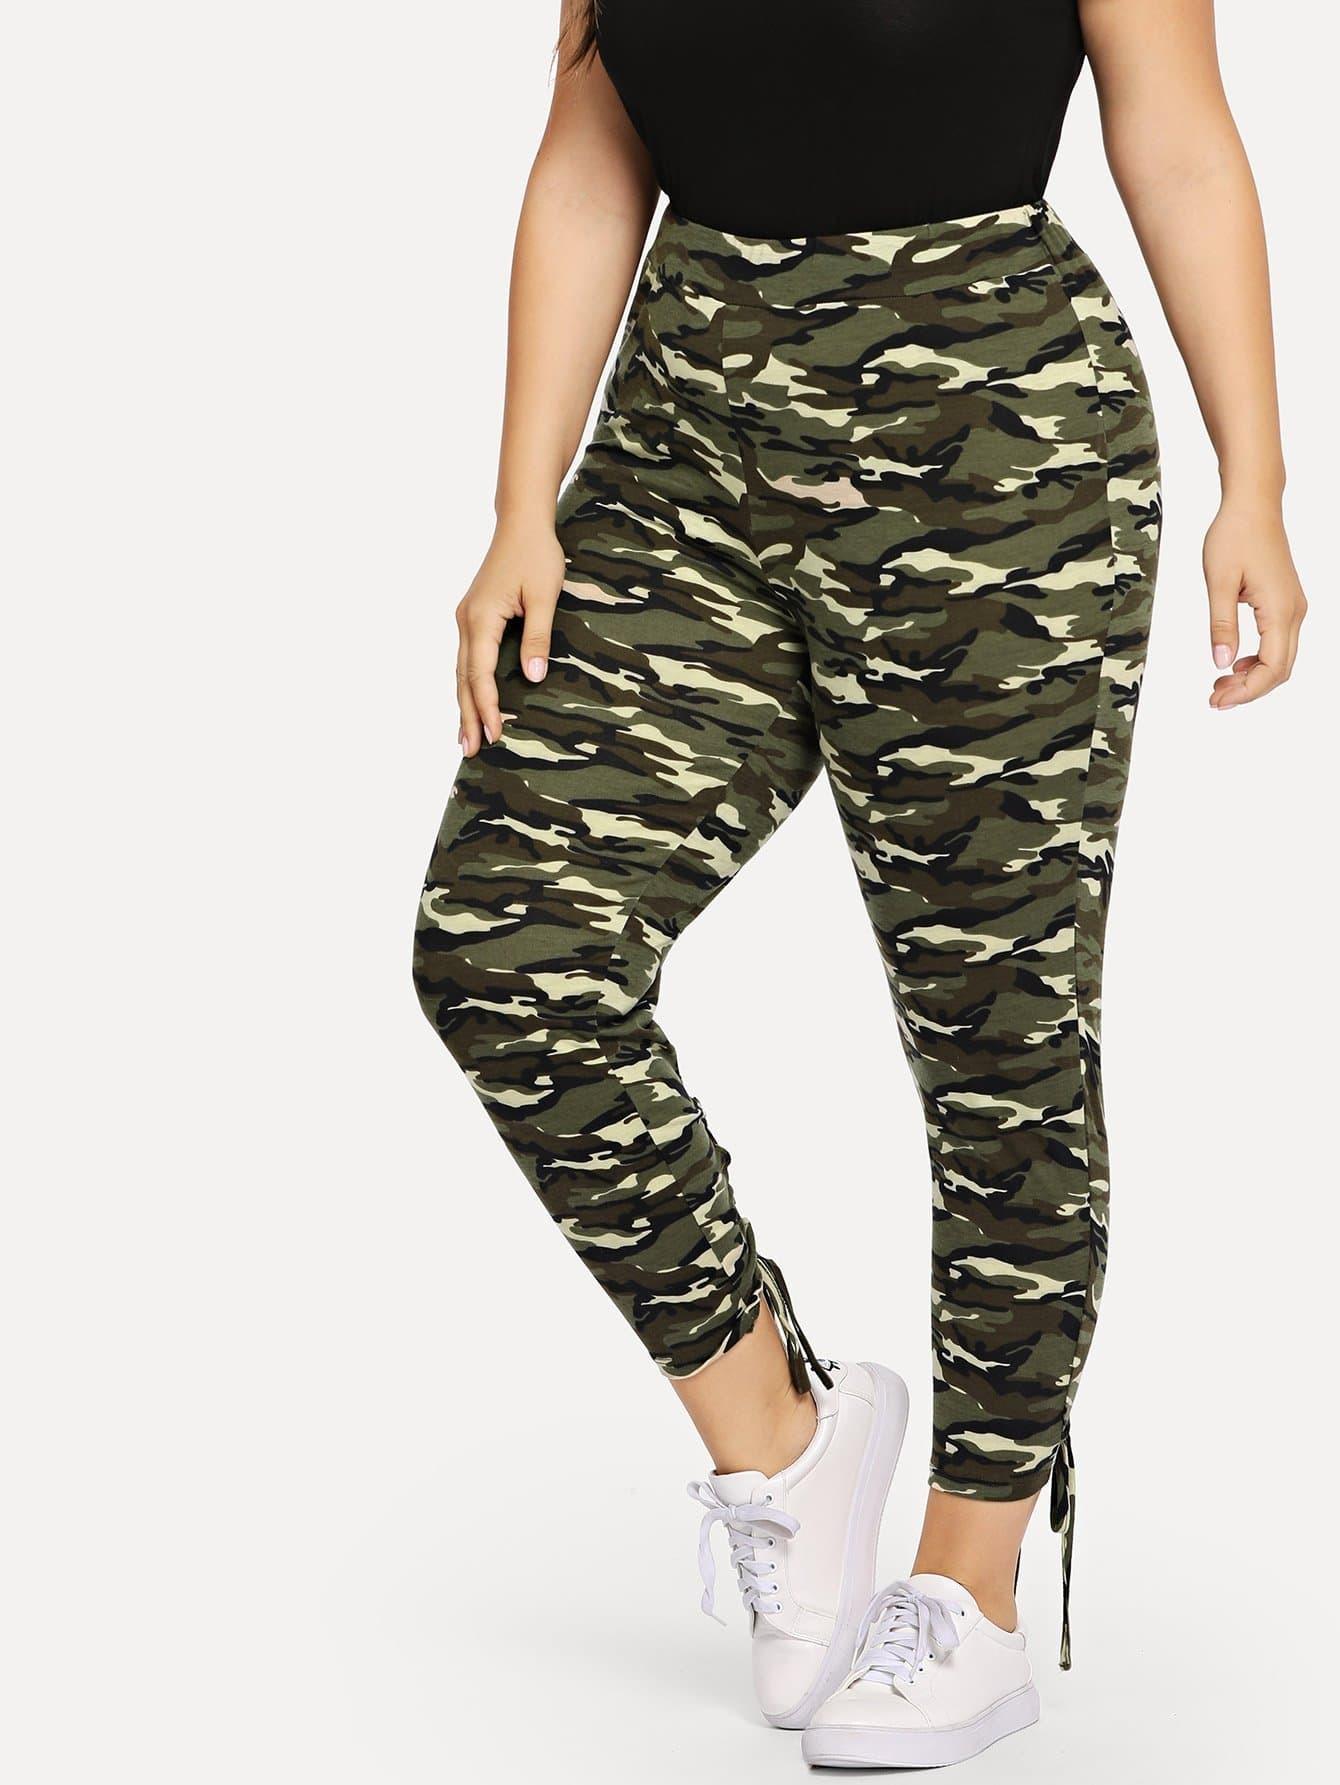 Plus Wide Waistband Camo Print Leggings wide waist camo print leggings